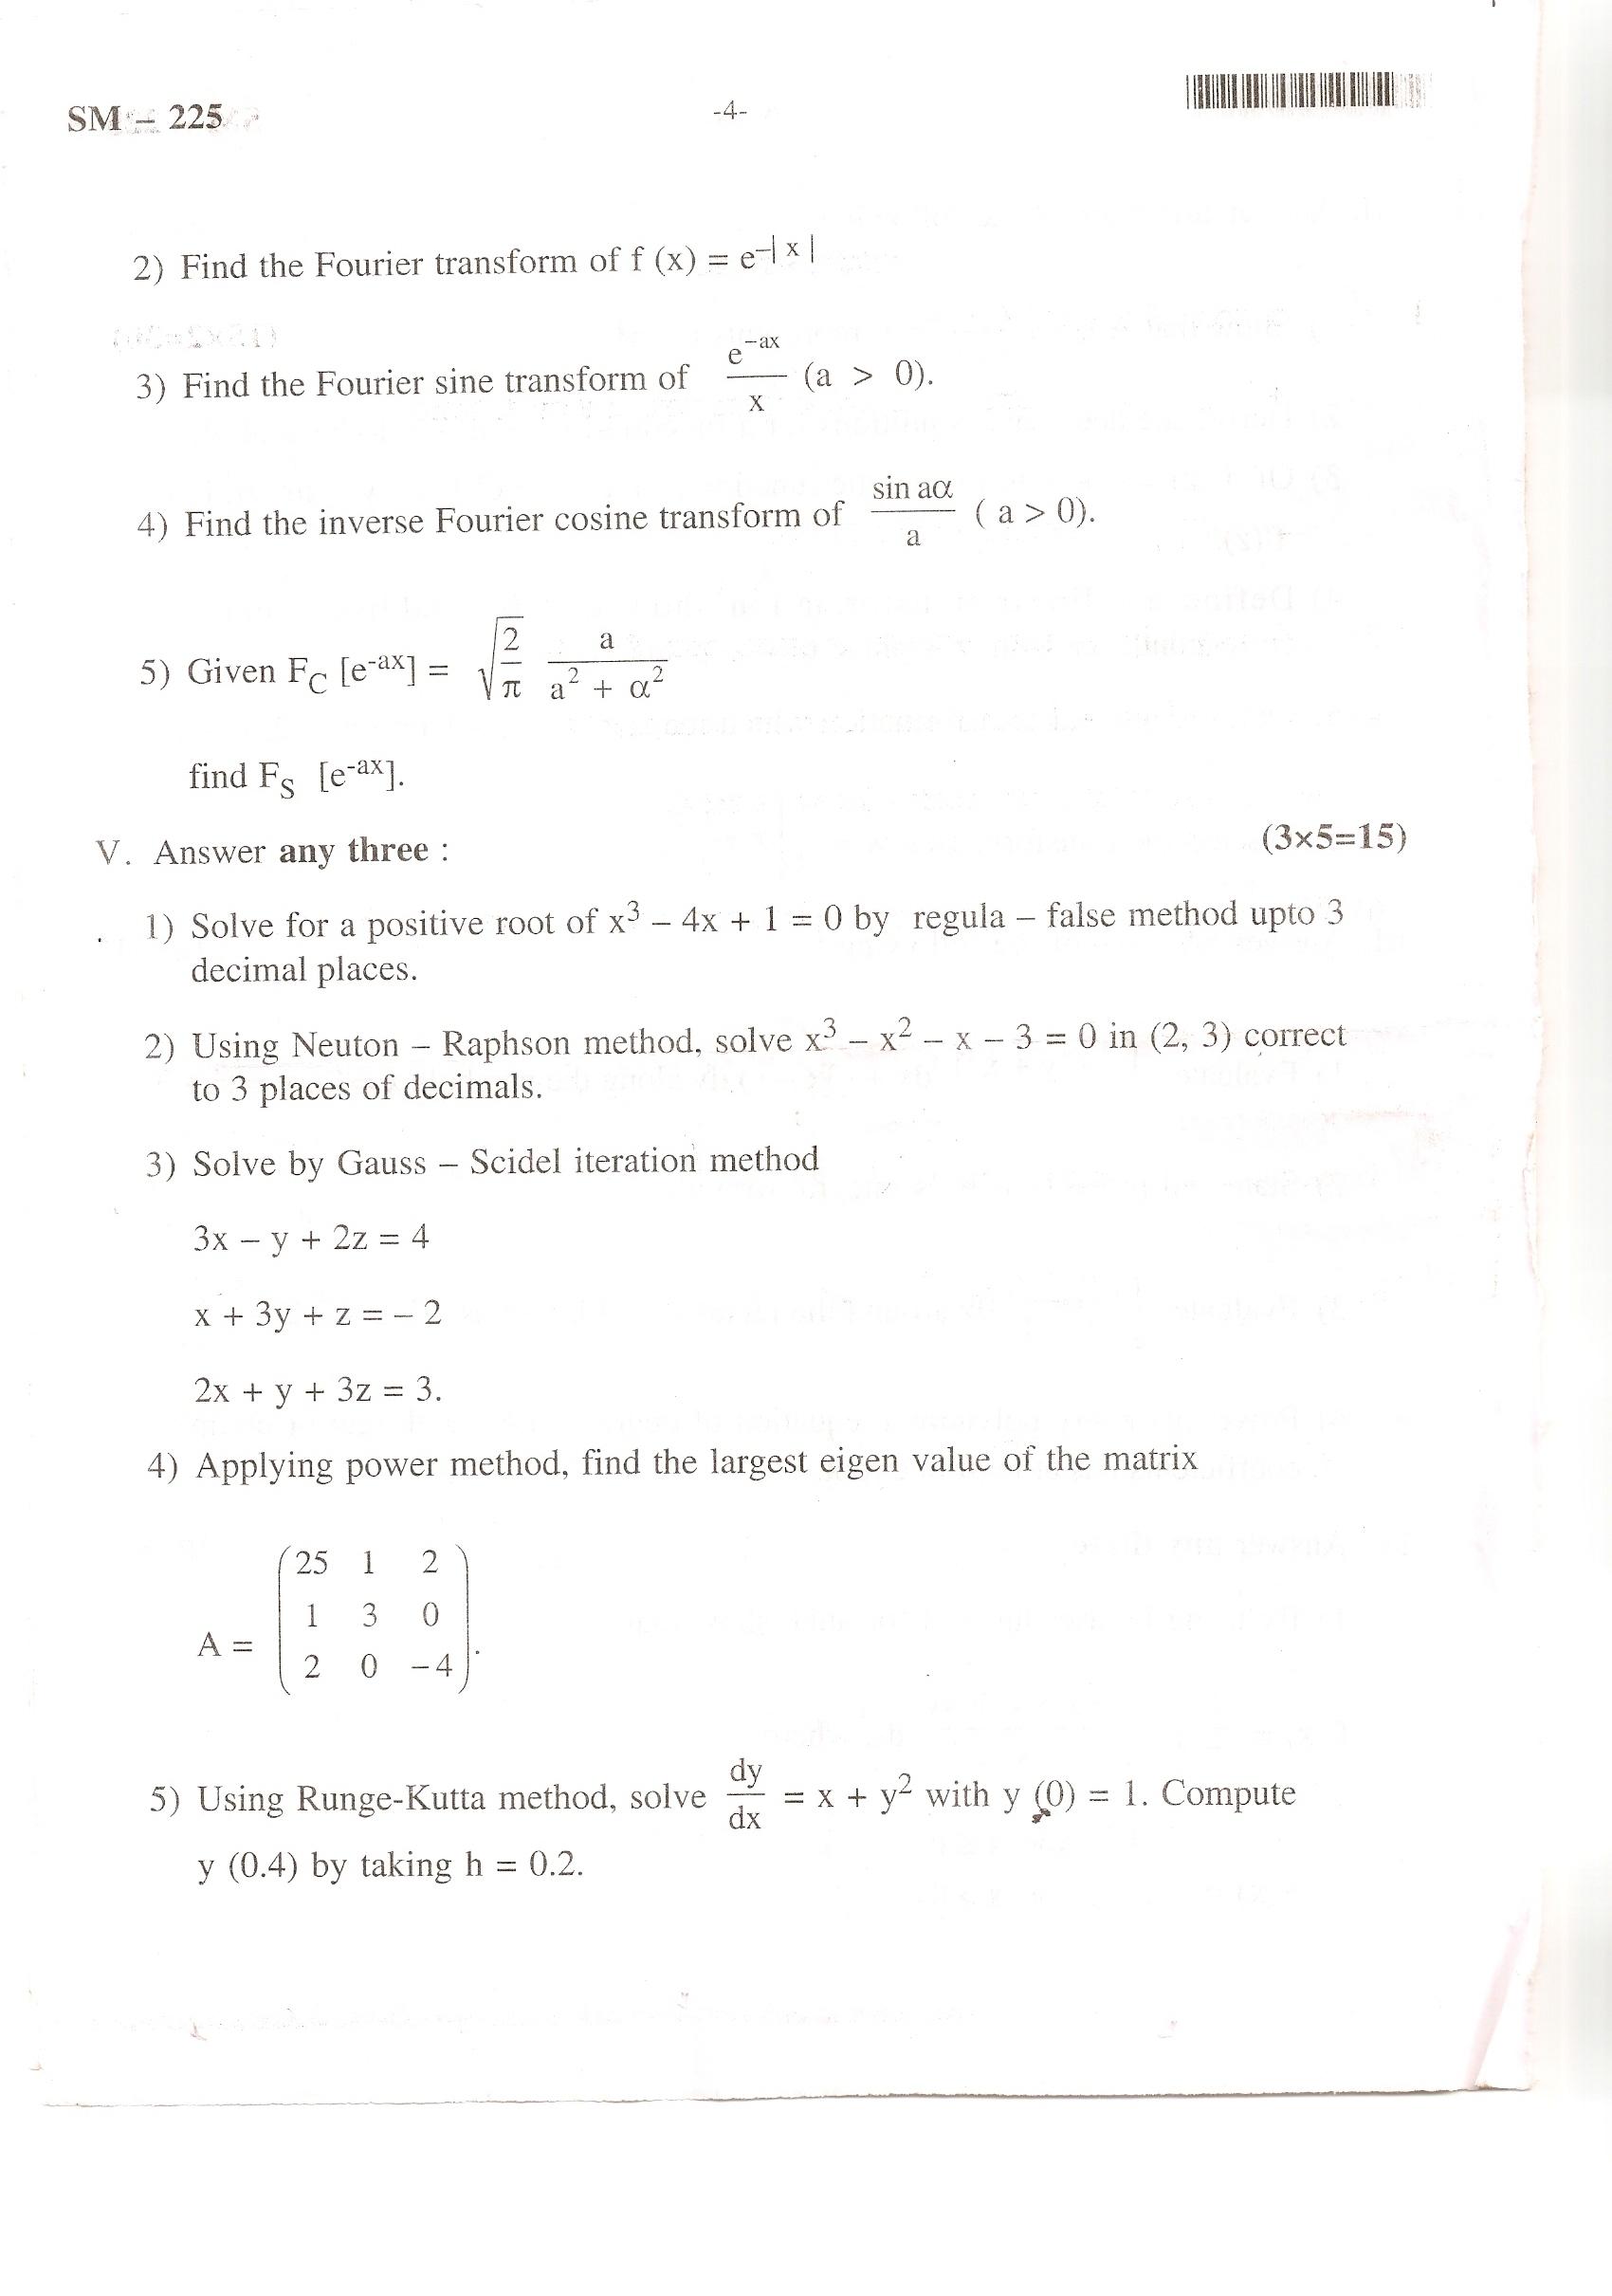 Bangalore University VI Semester B.A./B.Sc. Examination